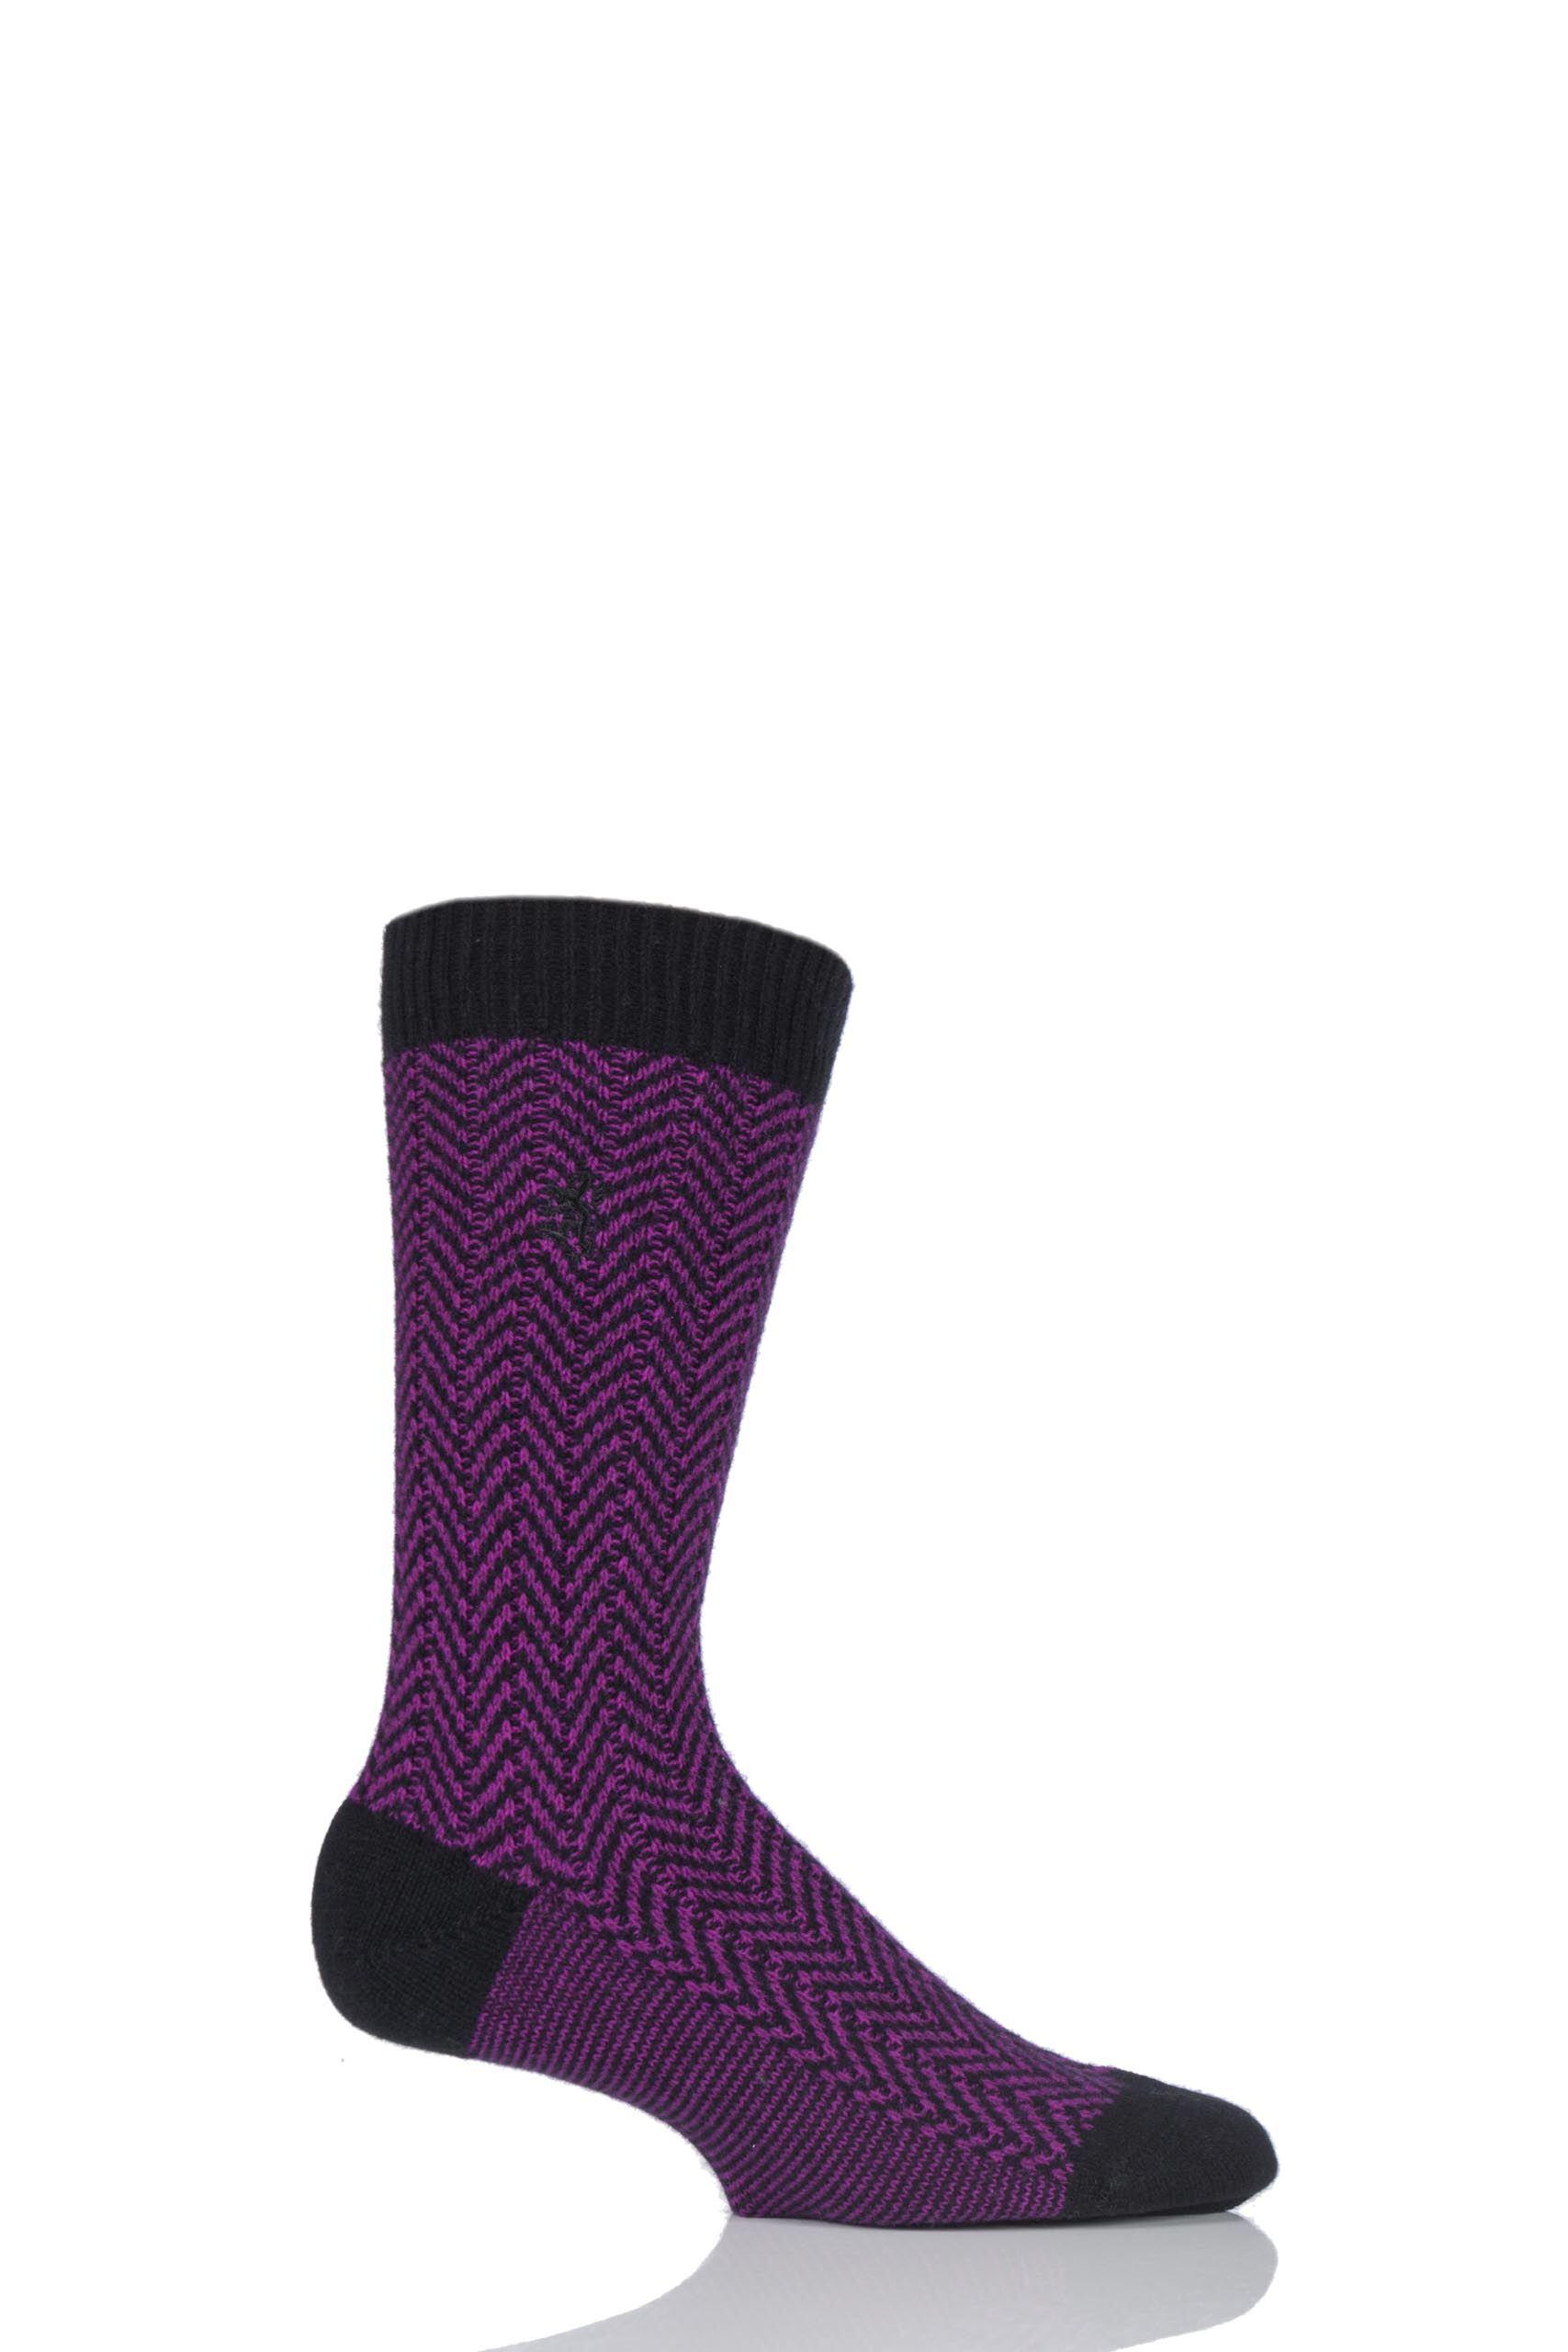 Image of 1 Pair Black 85% Cashmere Herringbone Socks Men's 9-11 Mens - Pringle of Scotland